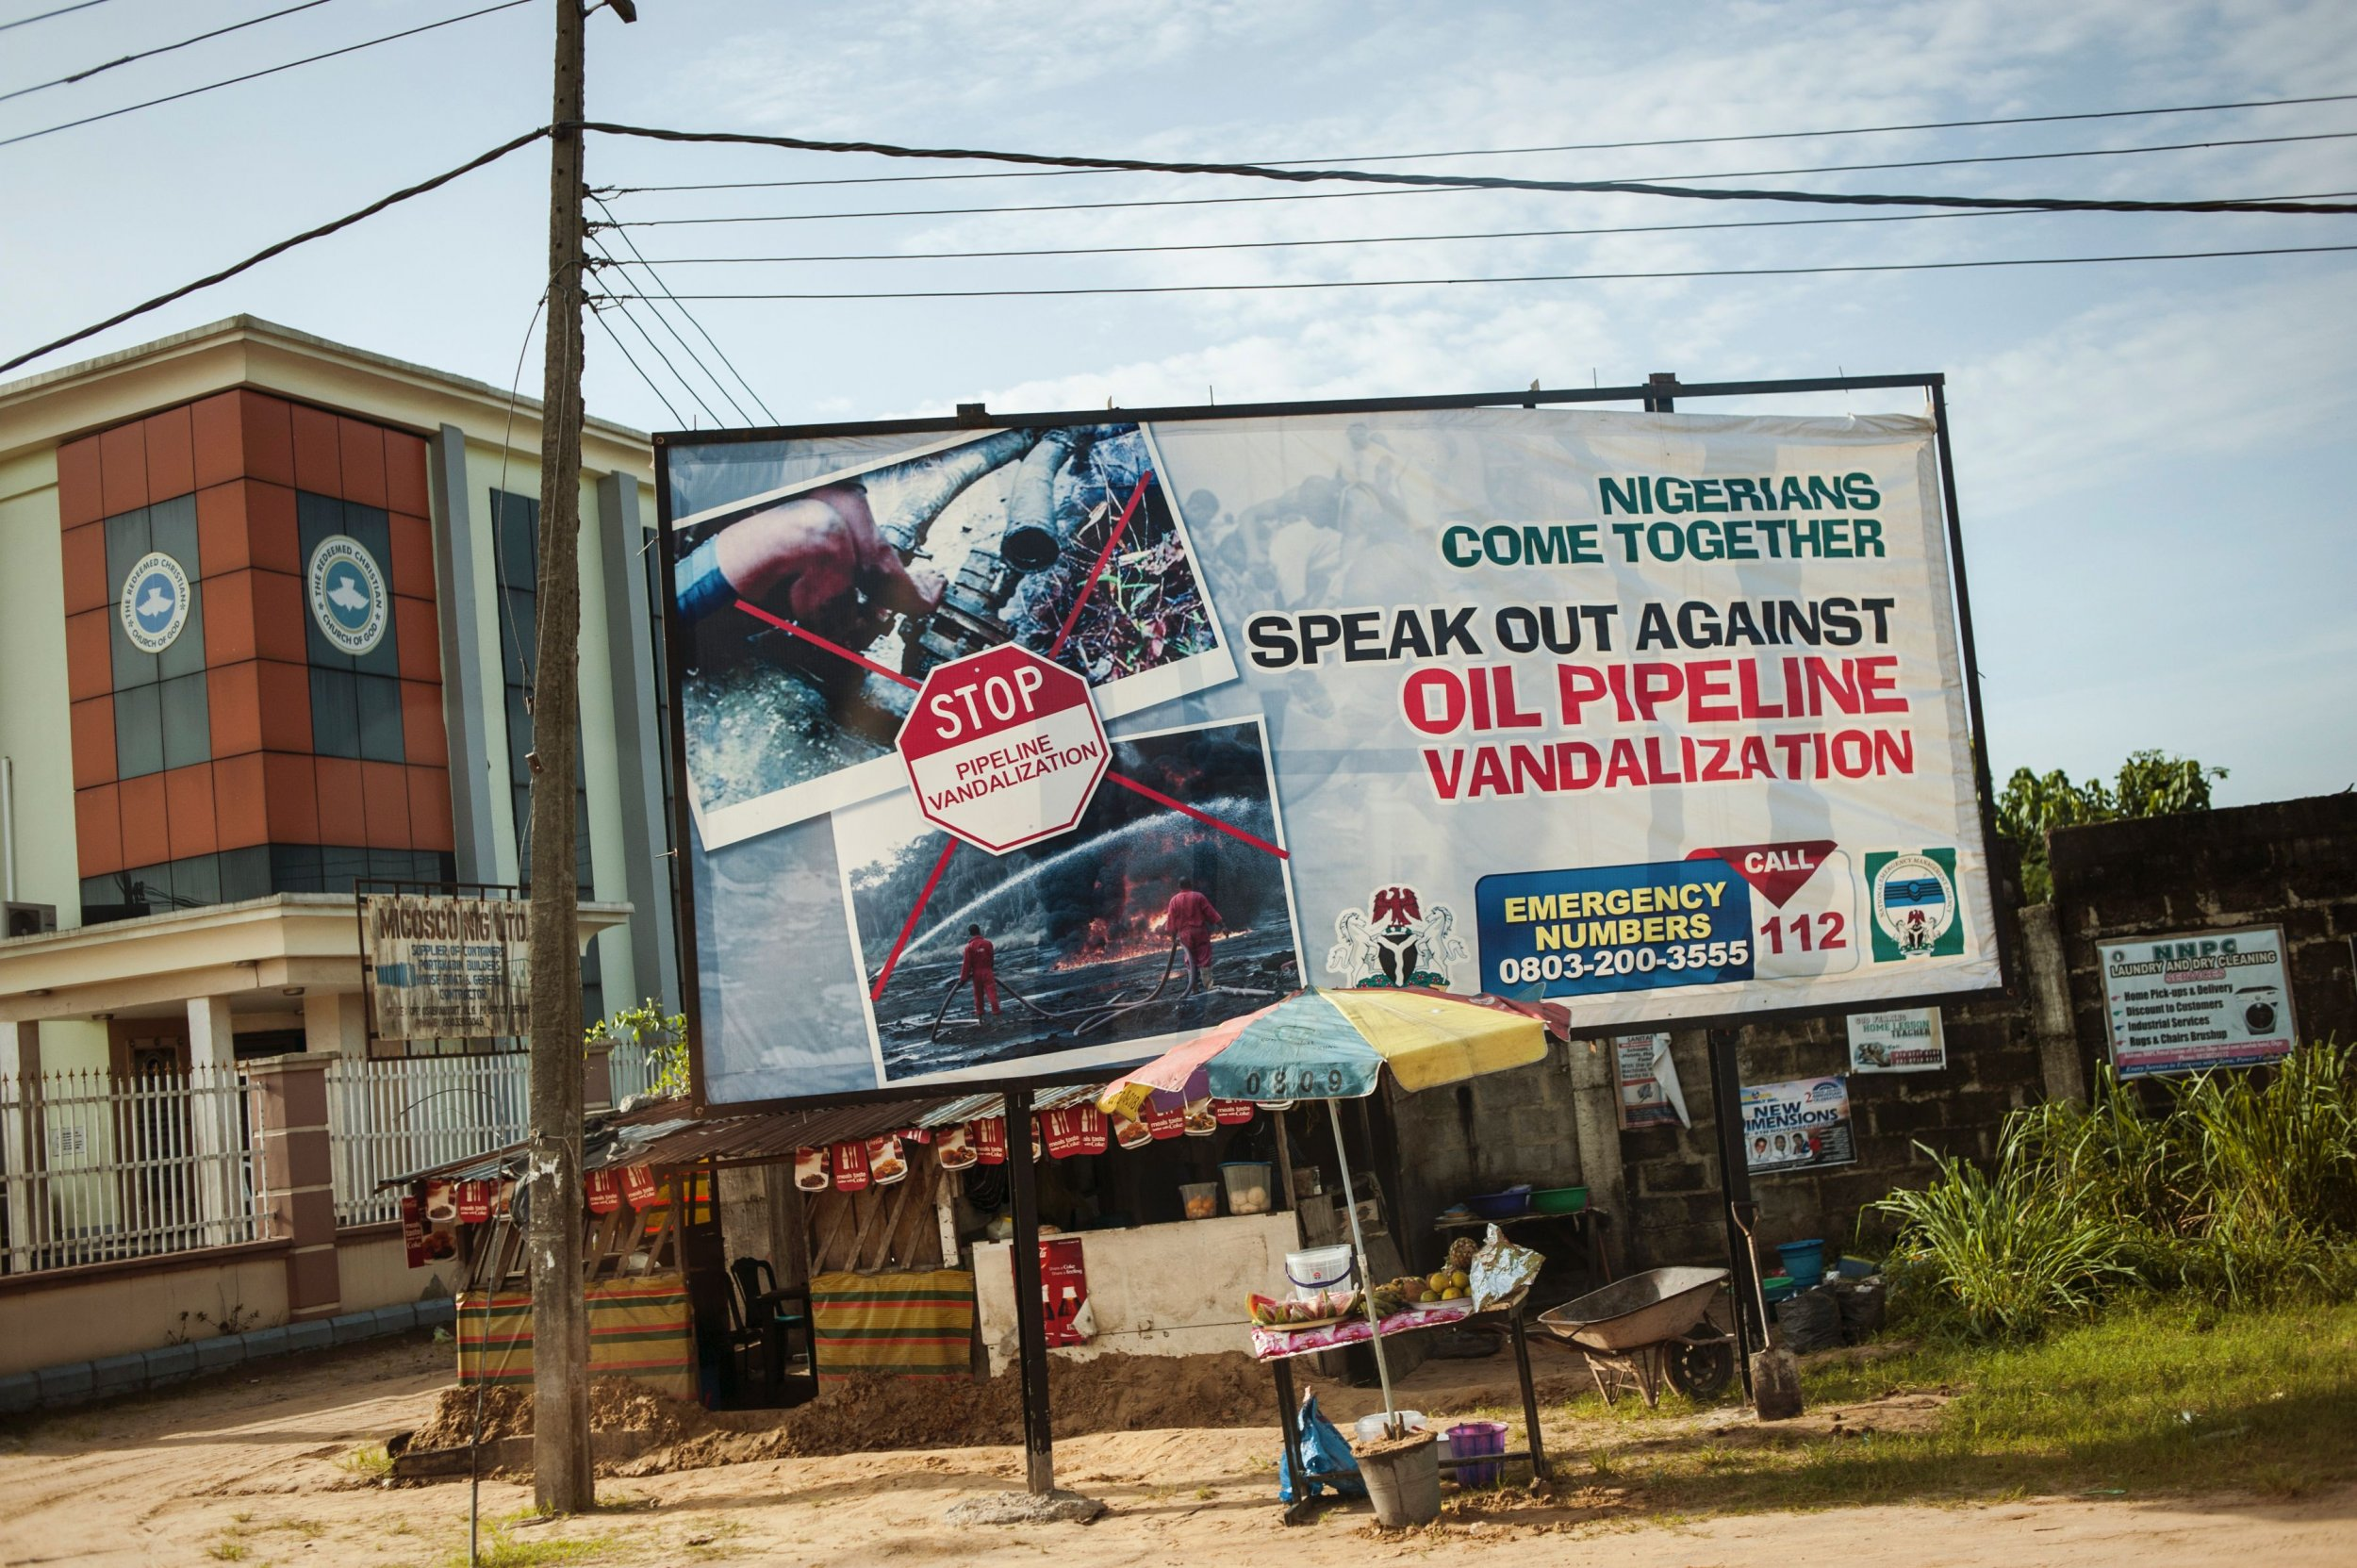 Niger Delta oil pipeline advertizing board